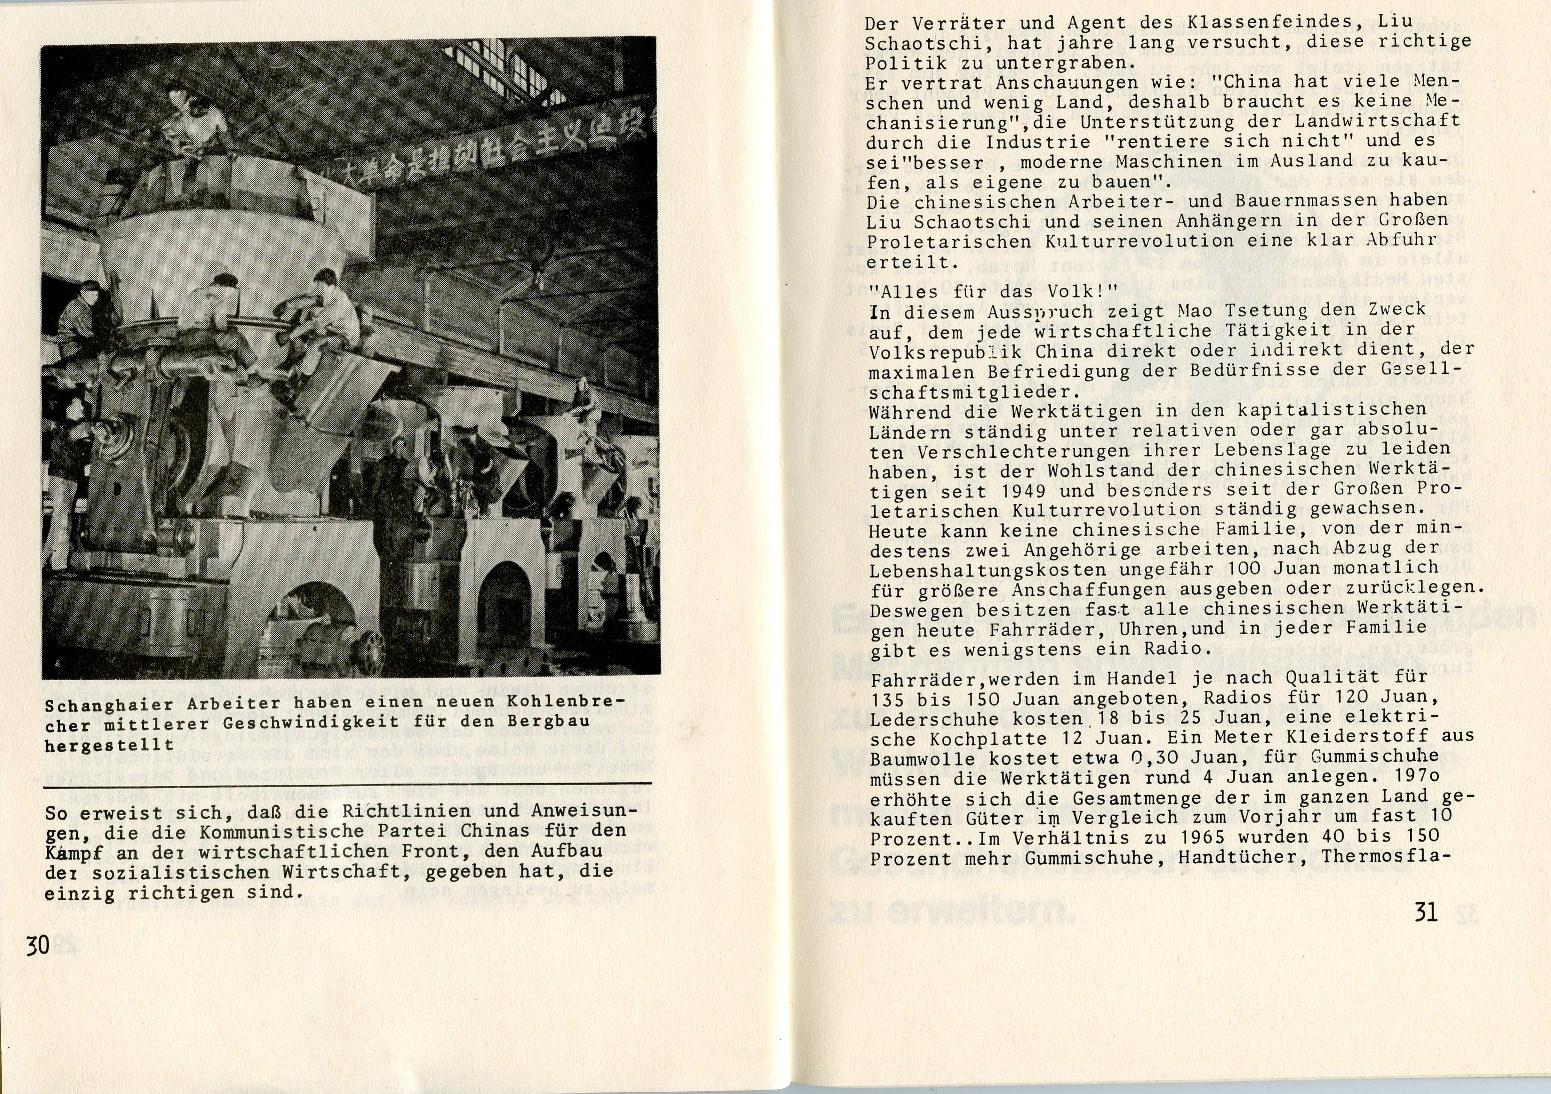 ZB_KPChinas_1971_17